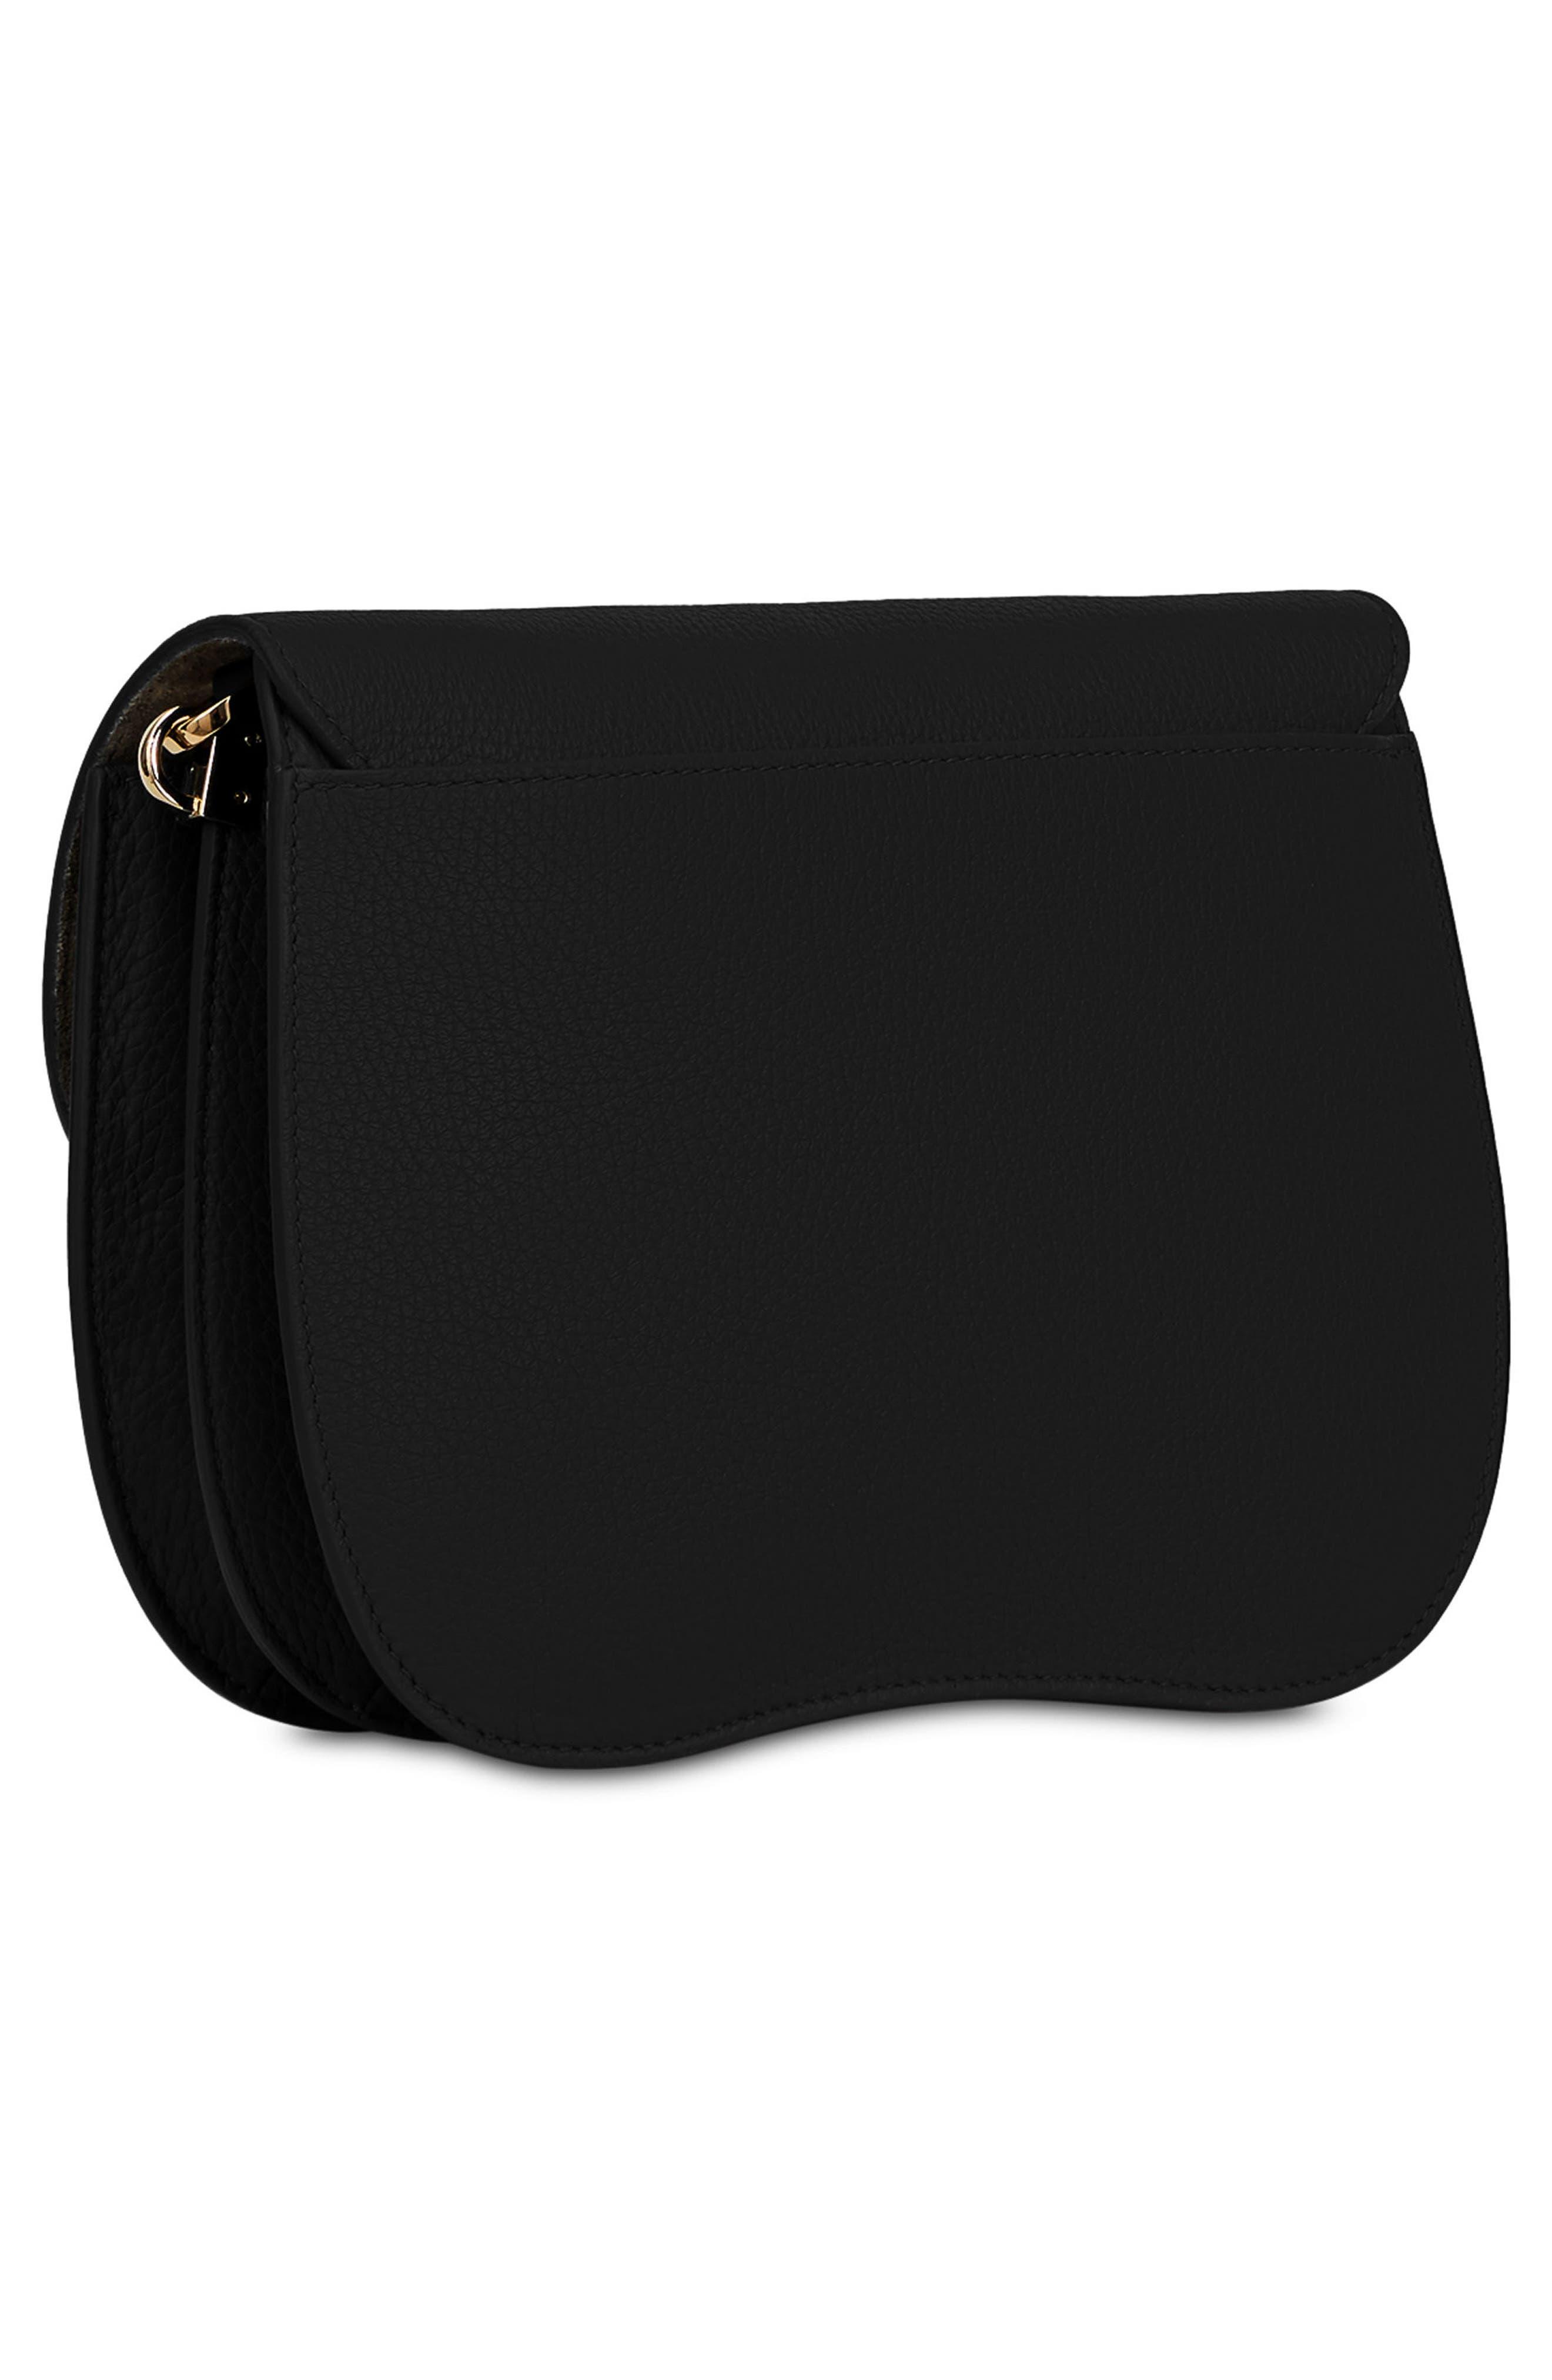 FURLA,                             Small Metropolis Leather Crossbody Bag,                             Alternate thumbnail 2, color,                             001